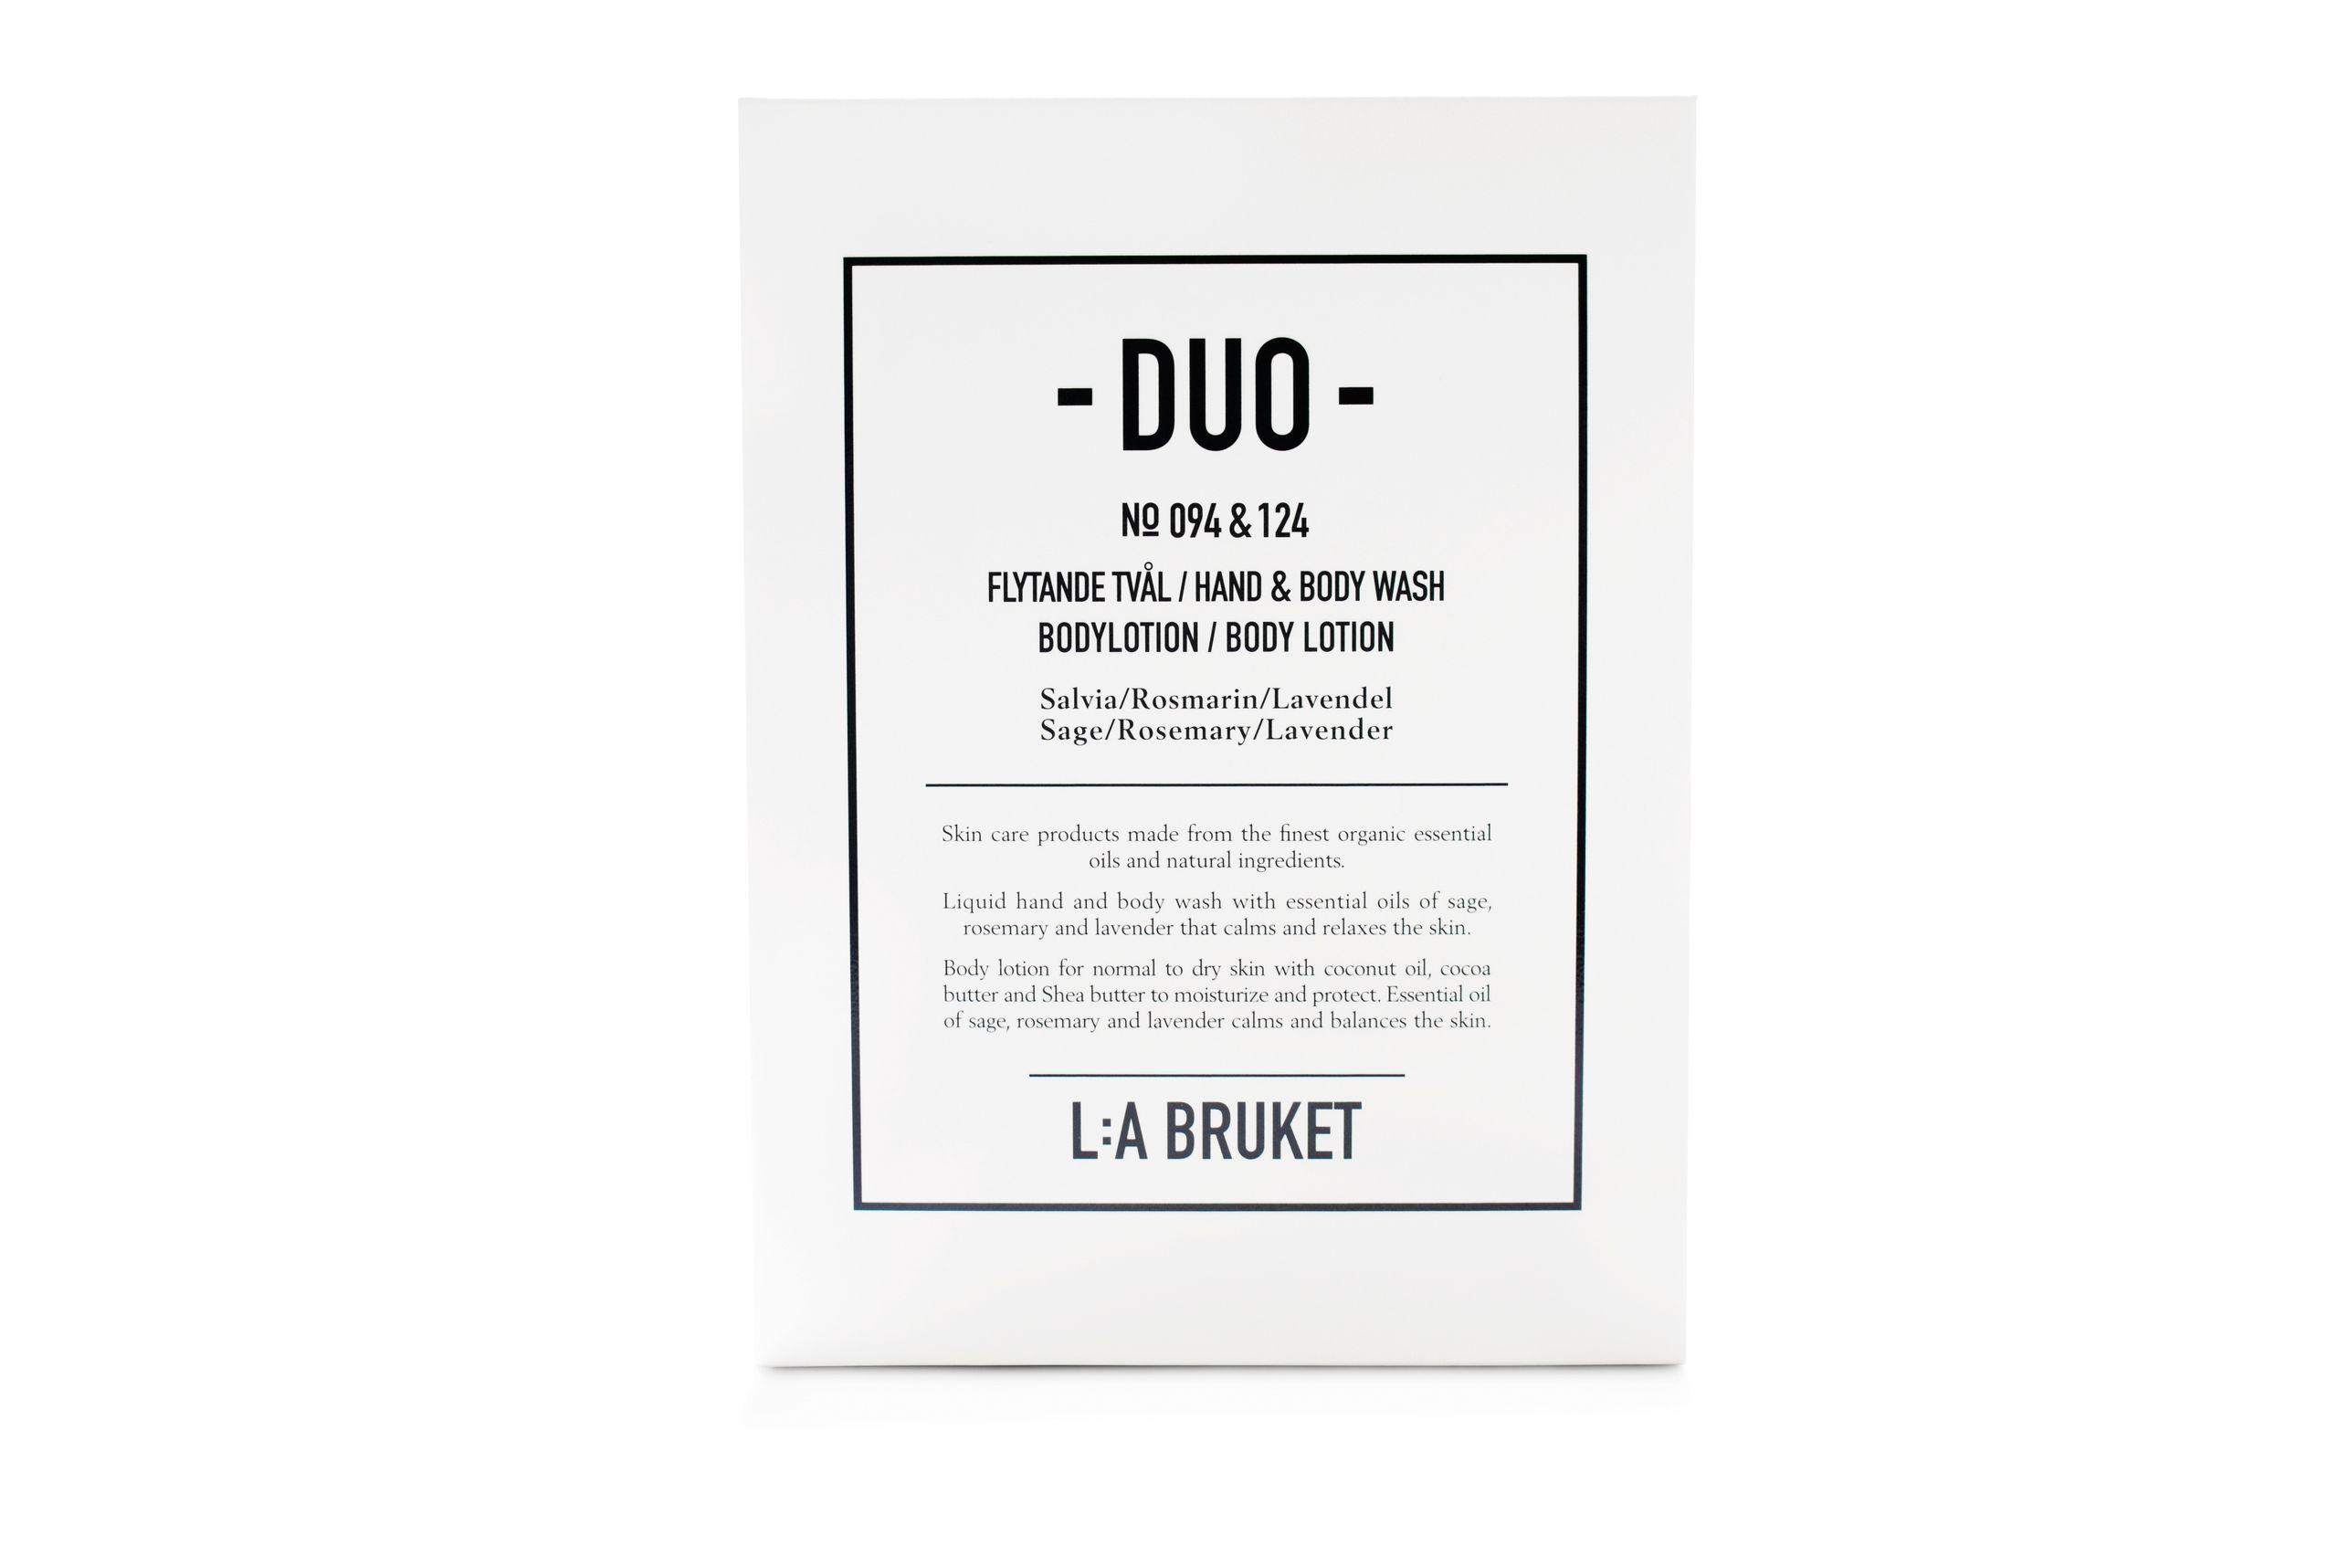 Duokit soap/bodylotion